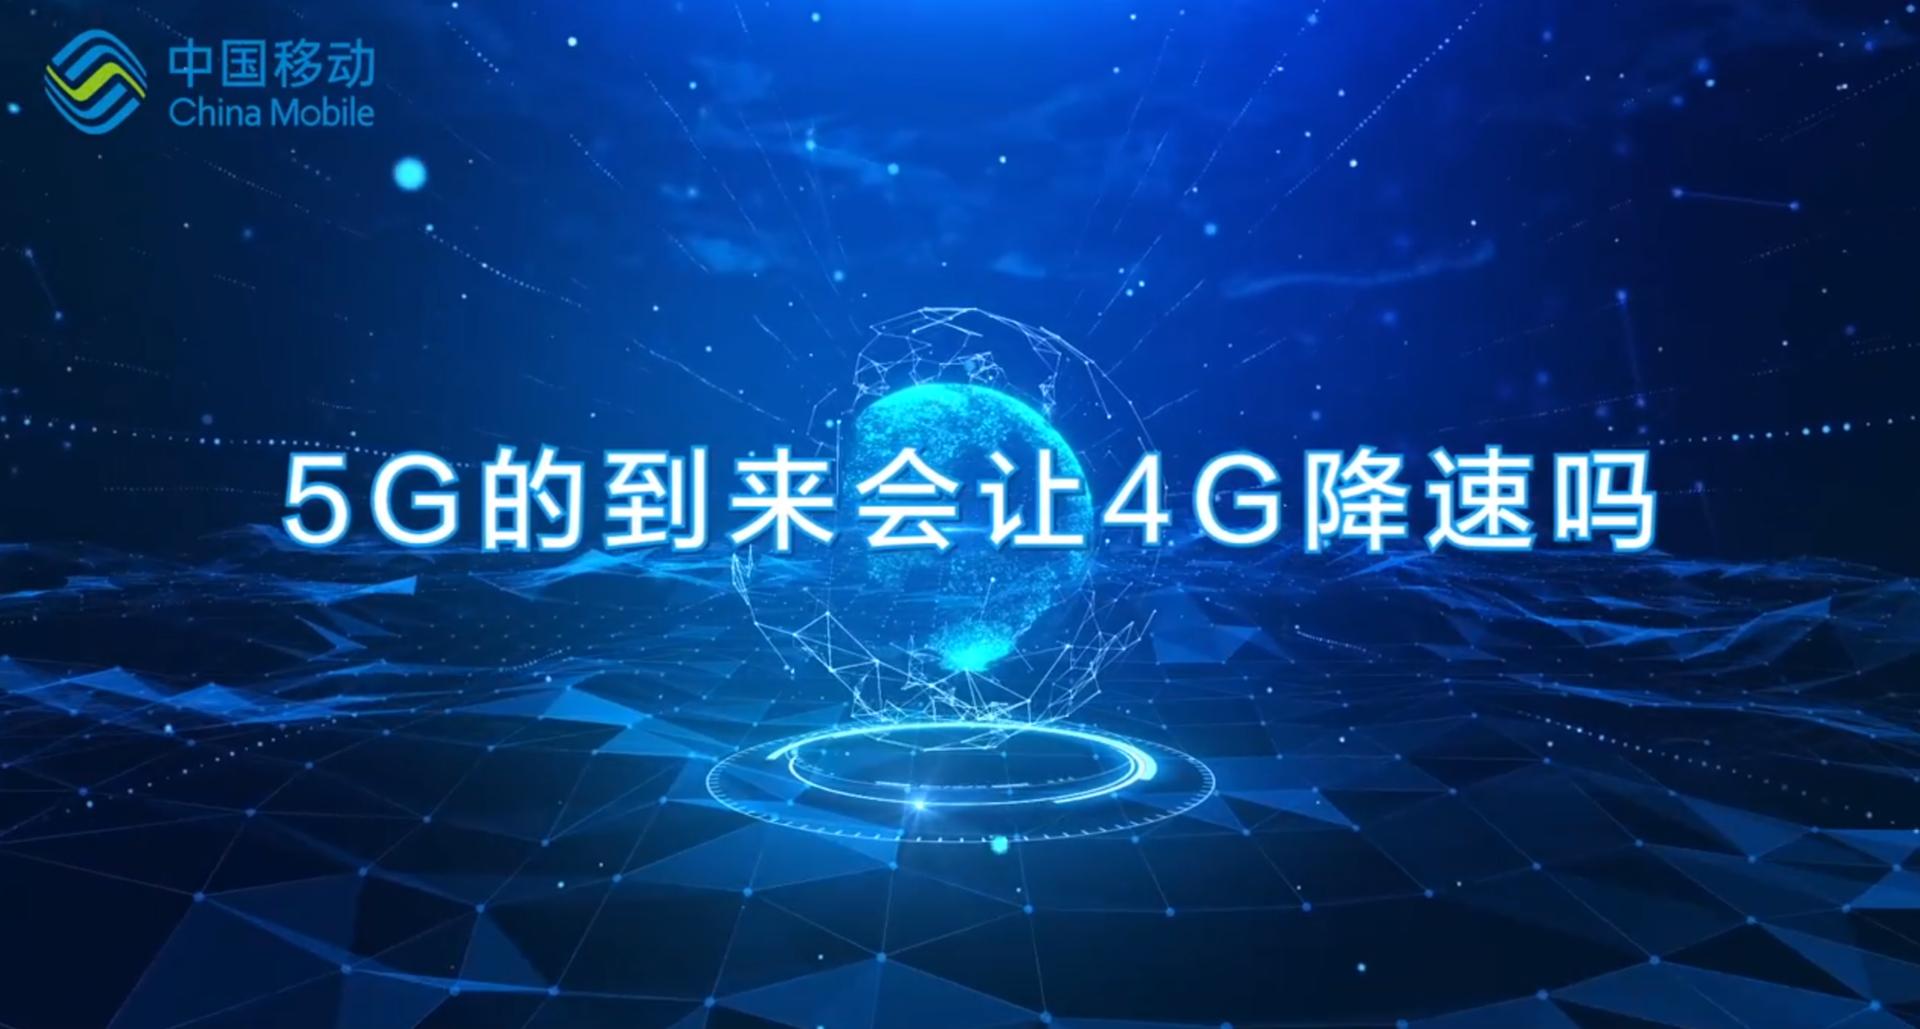 5G商用会影响4G使用吗 中国移动官方回应并不会!